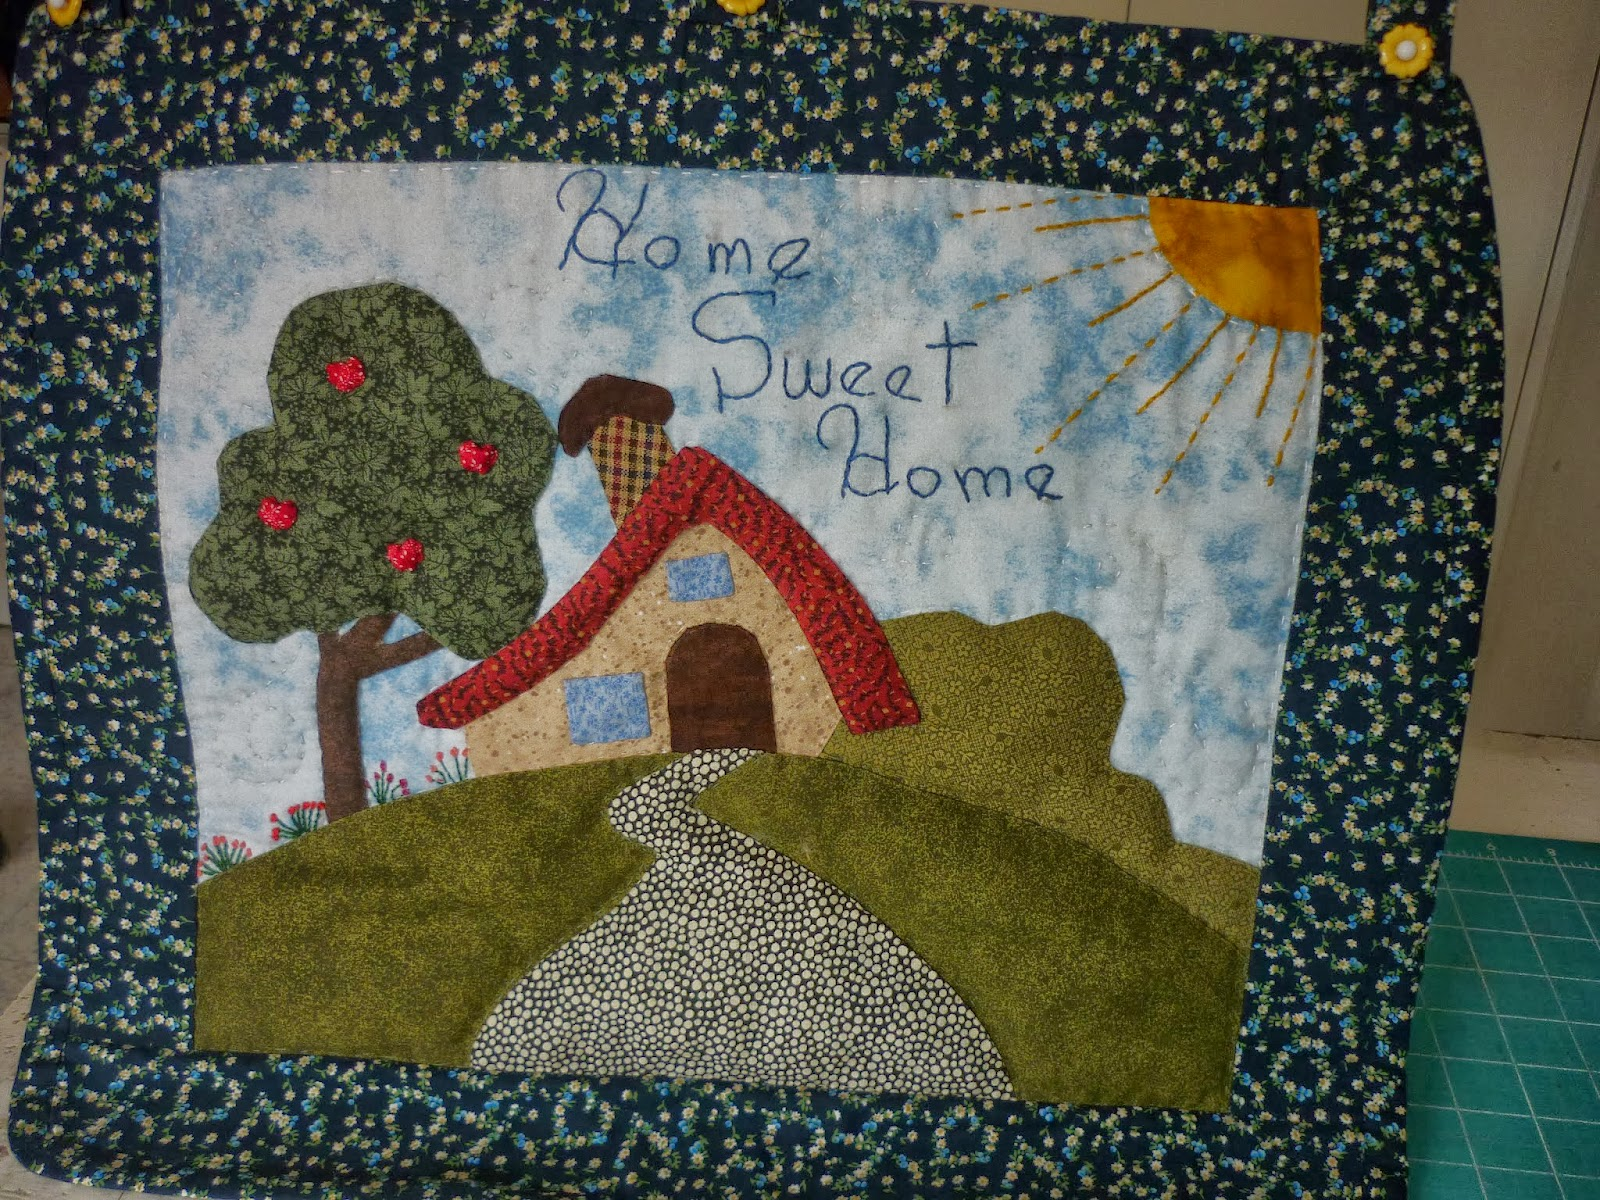 Casita del patchwork casita home sweet home - La casita del patchwork ...